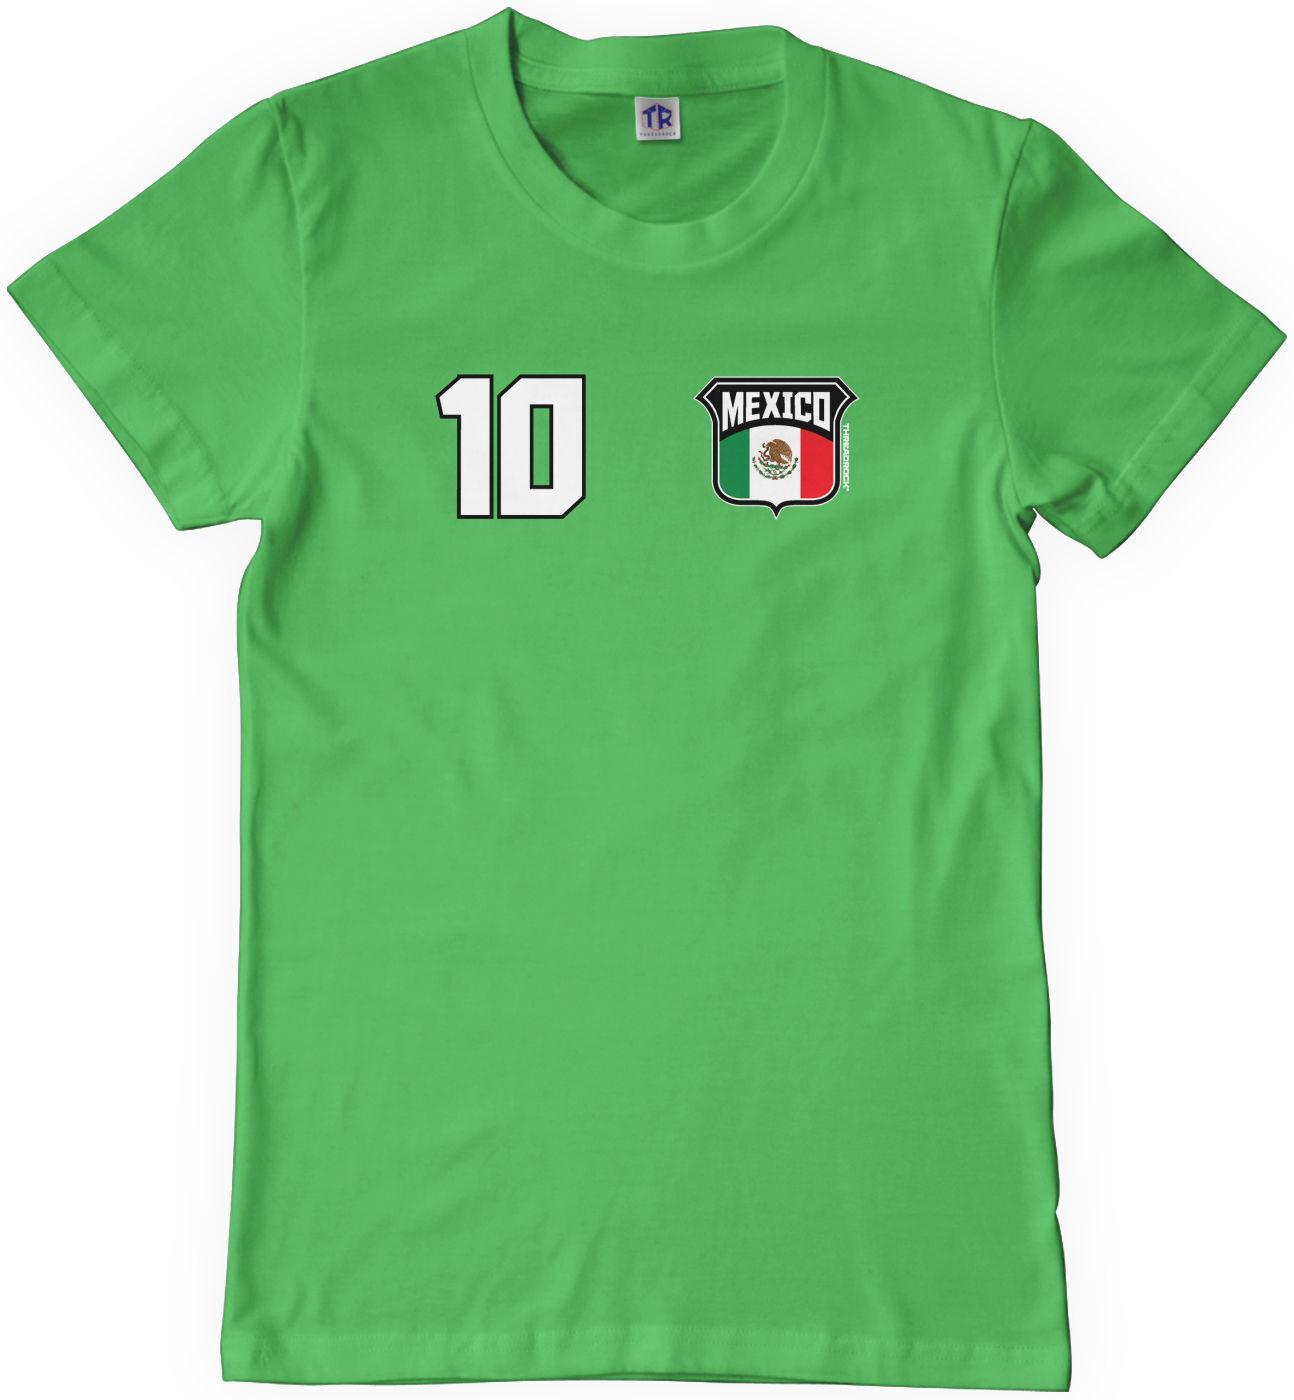 06ef7e287 Threadrock Kids Team Mexico Soccer Youth T Shirt World Cup Mexican Futbol  Men Women Unisex Fashion Tshirt Cool Tees Graphic T Shirt From ...